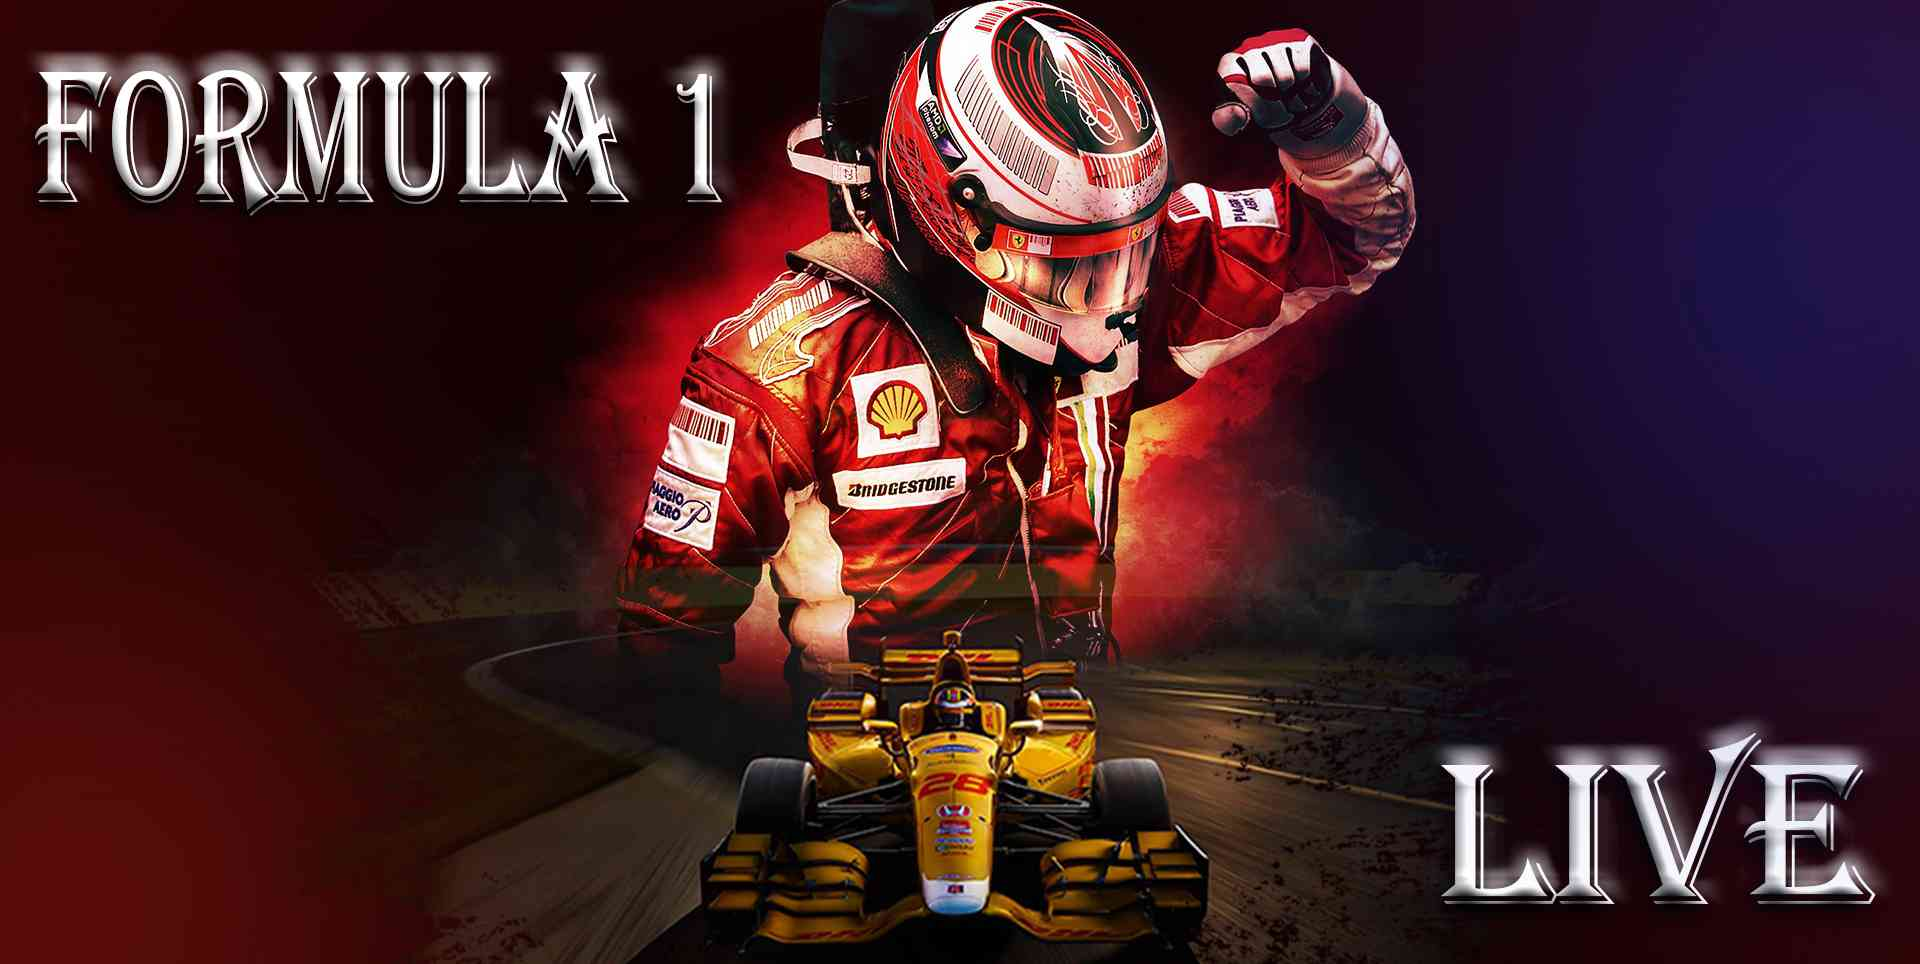 2015-formula-1-monaco-grand-prix-live-streaming